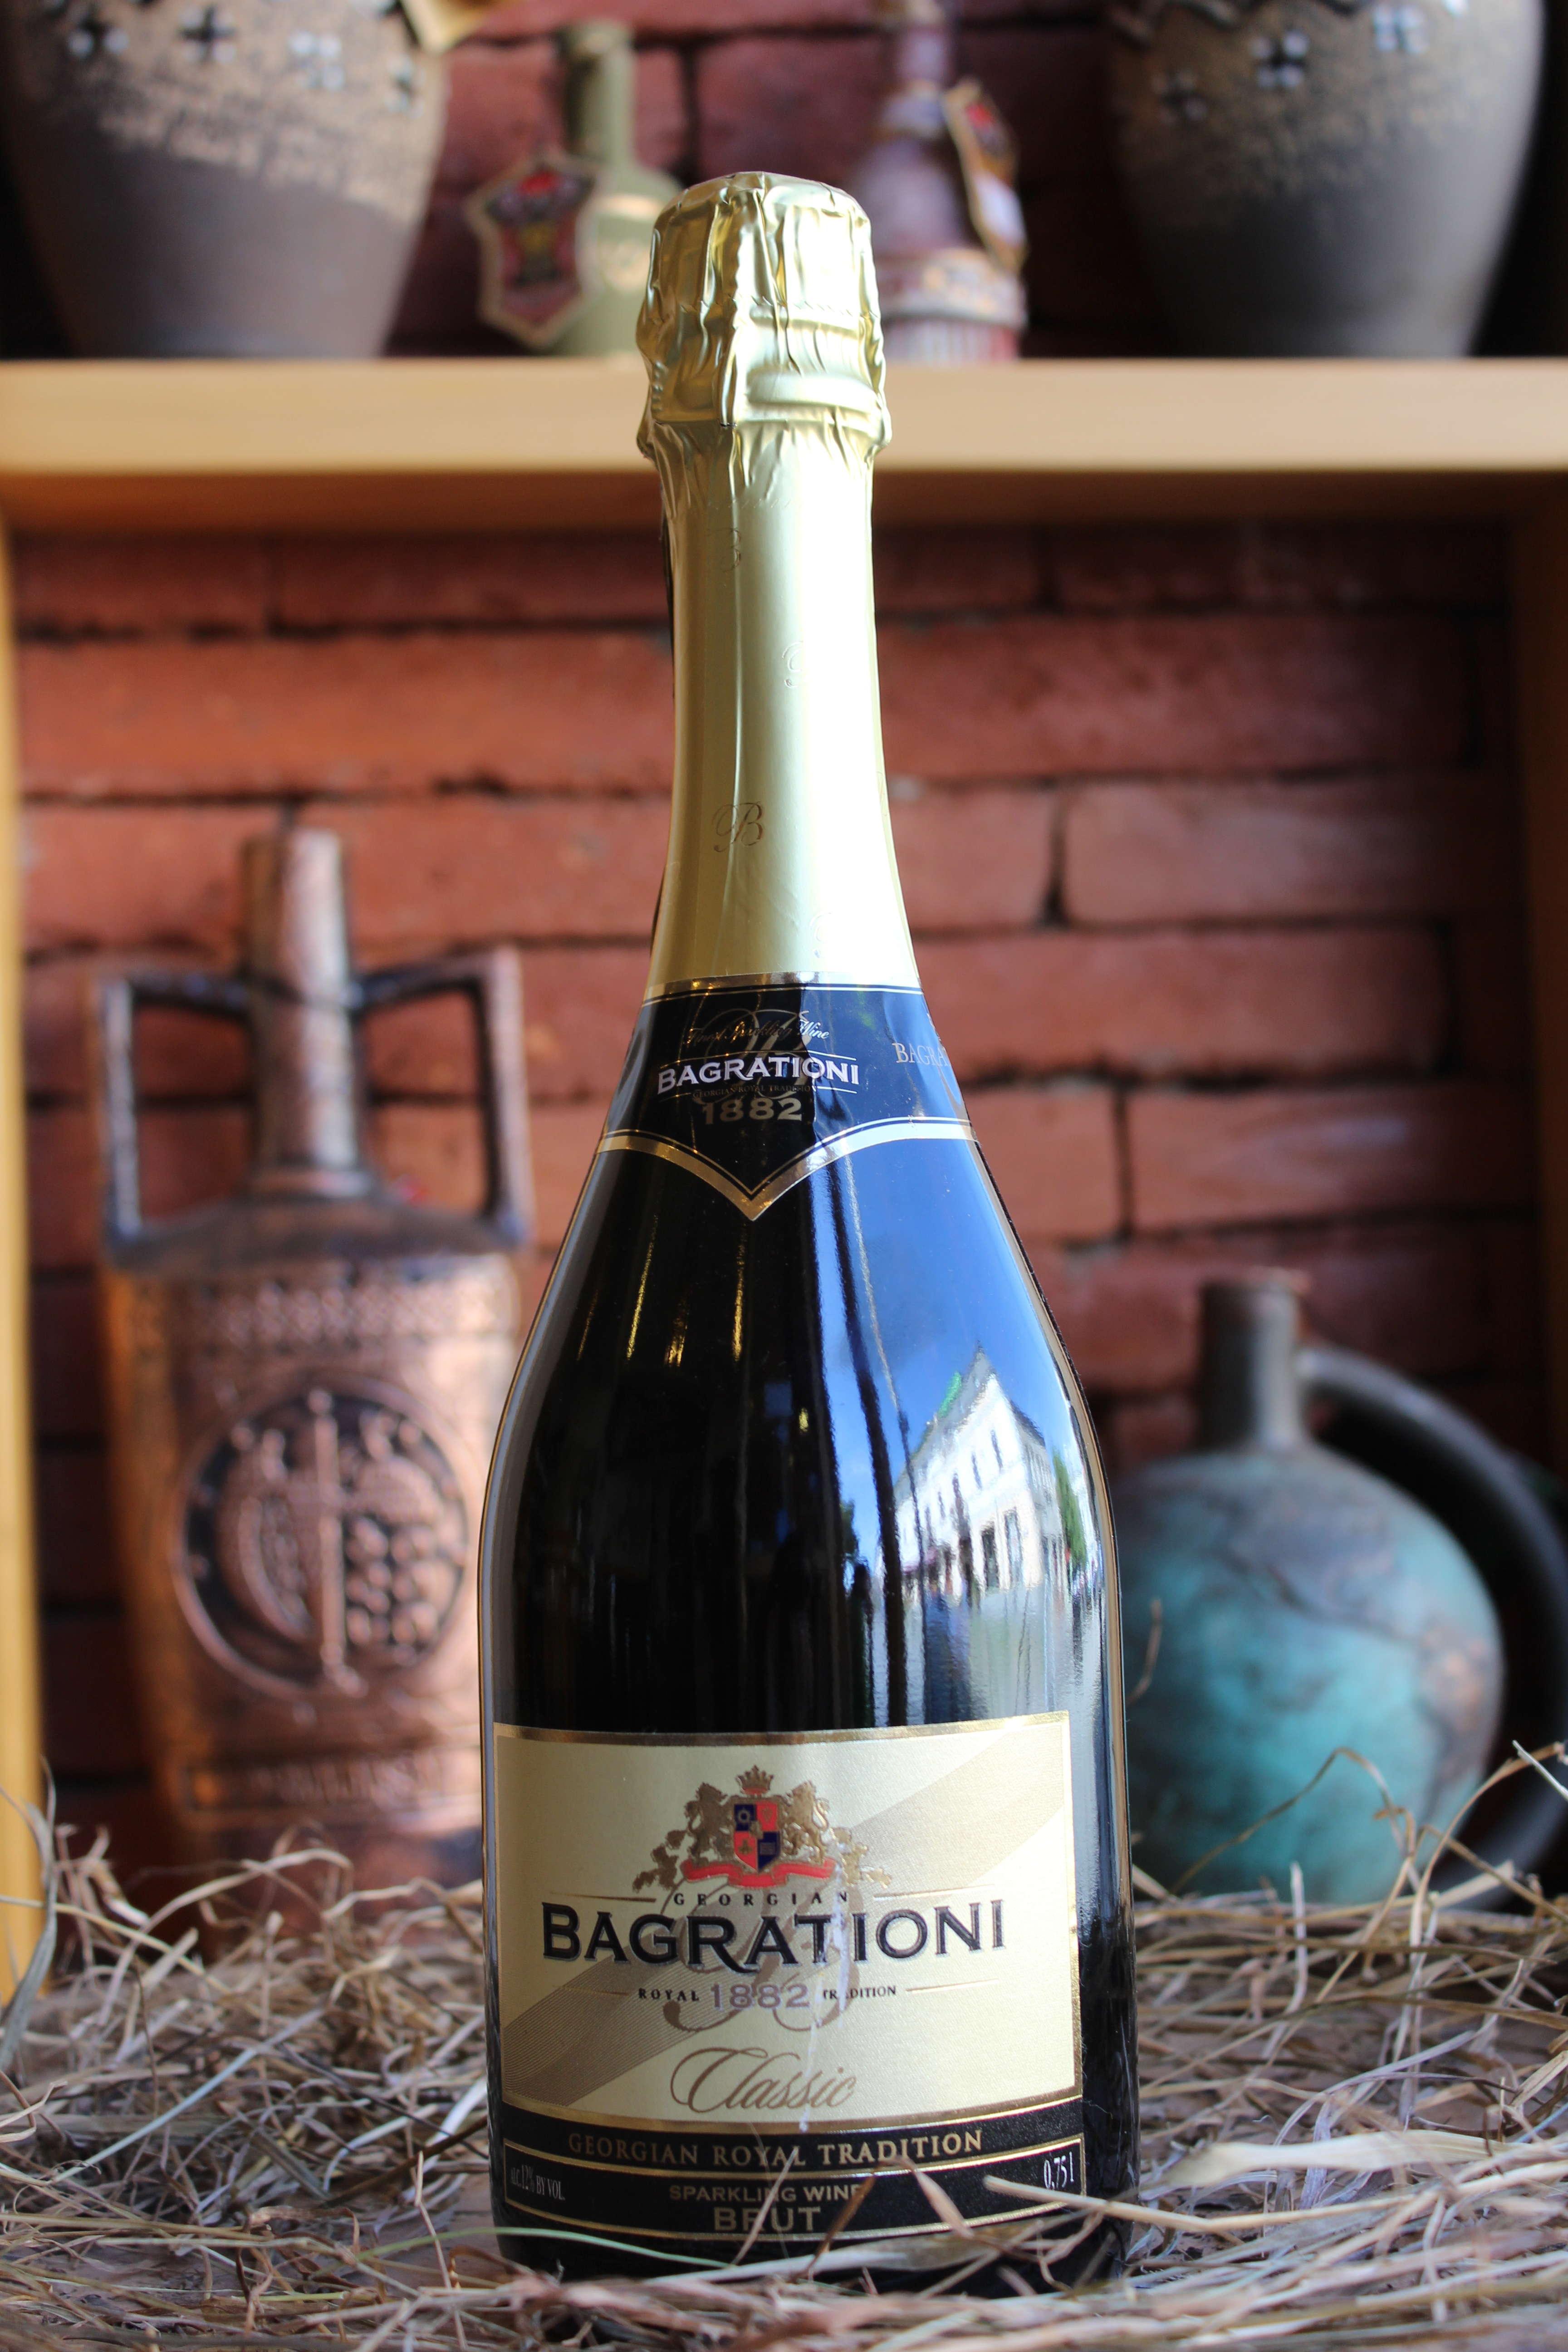 Bagrationi - Brut